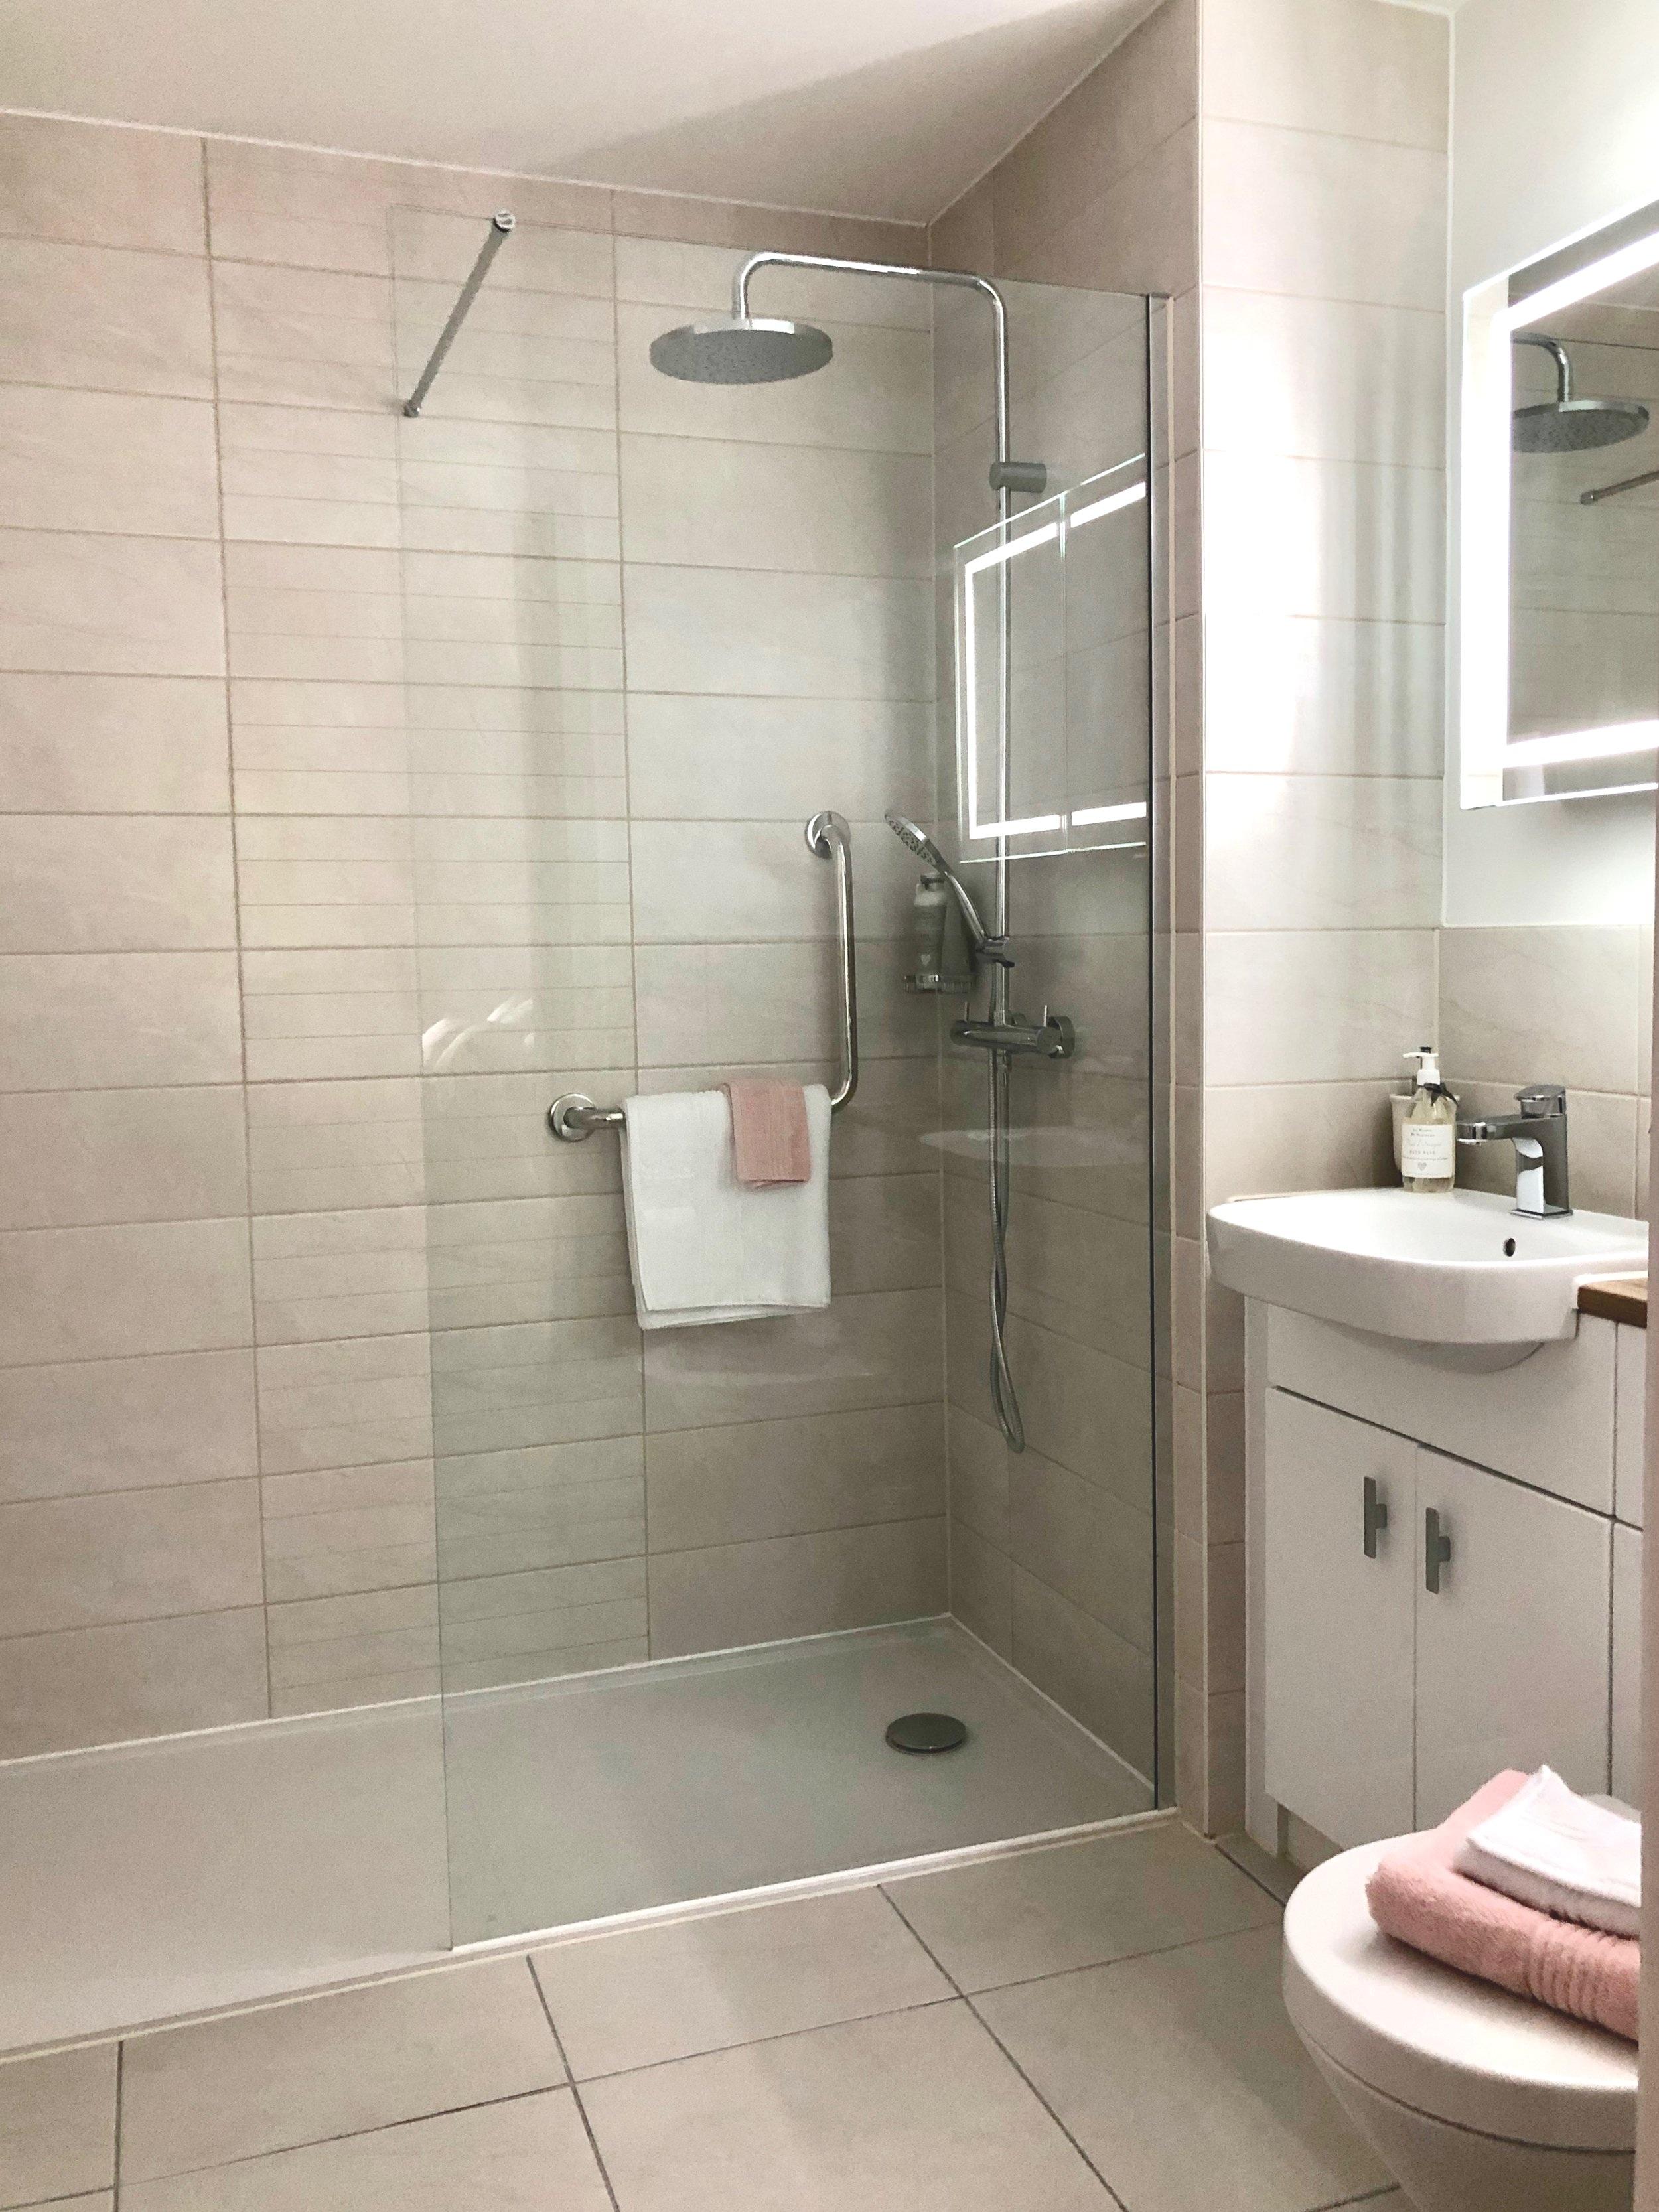 Just love the illuminated mirror & rain shower.